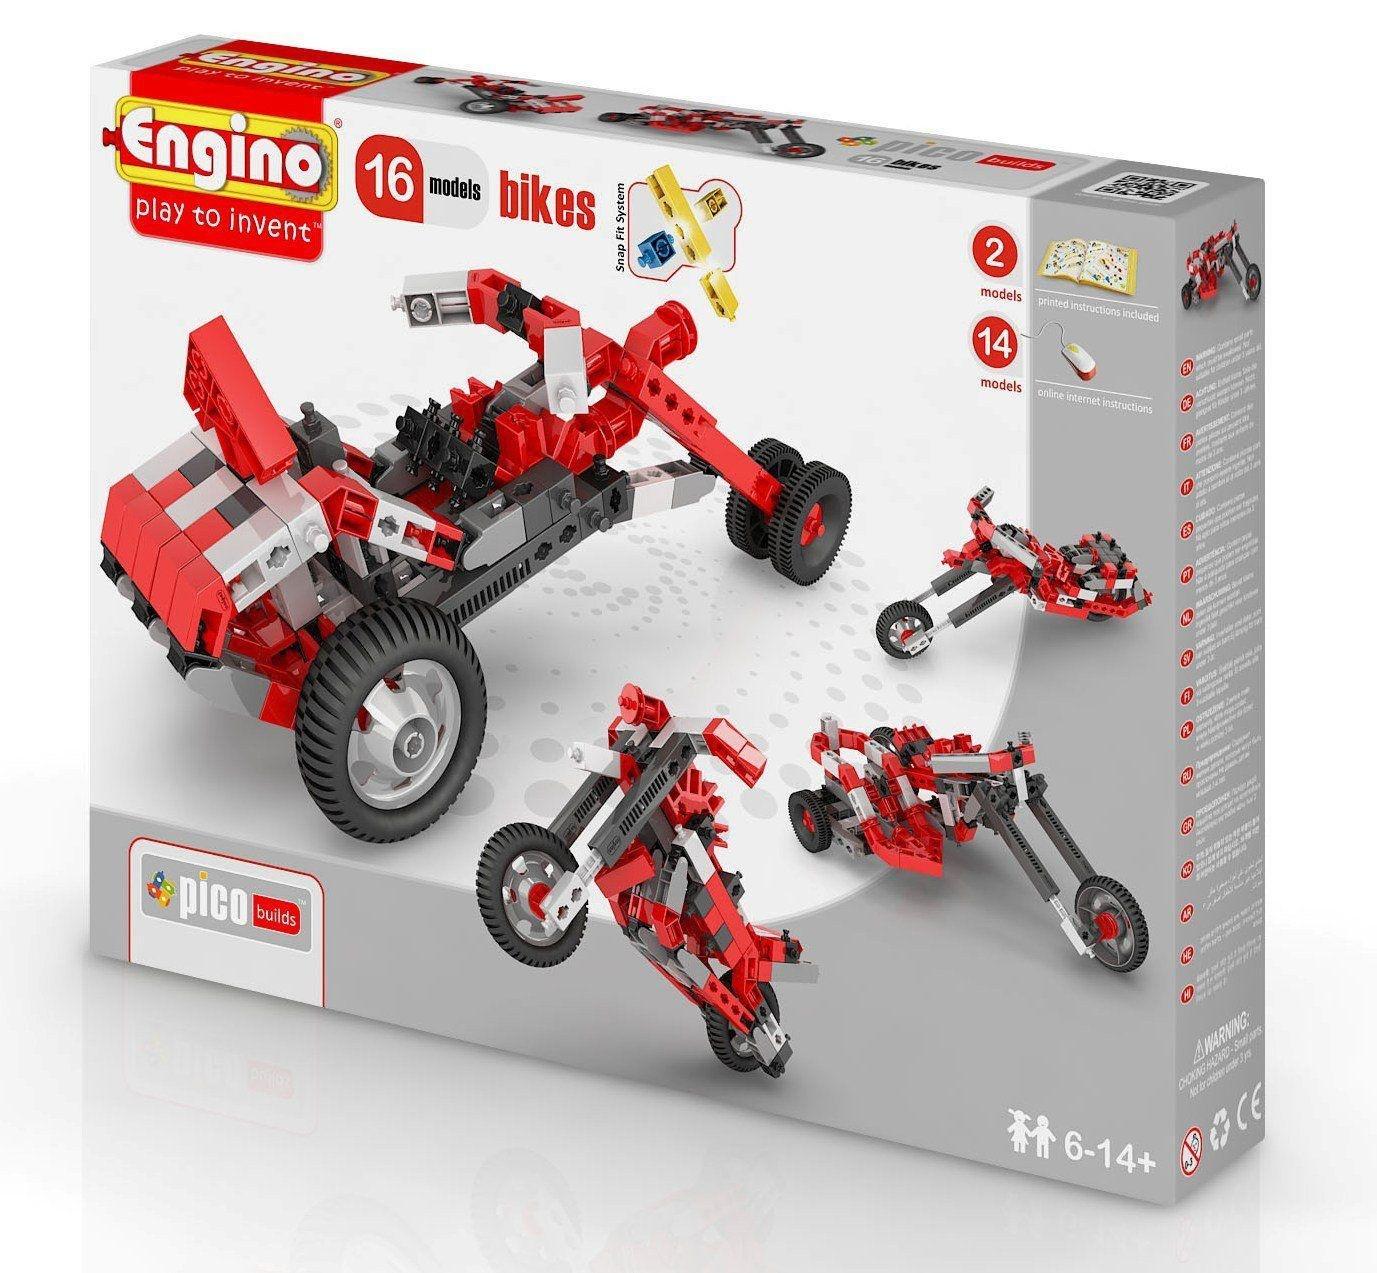 Конструктор Engino PICO BUILDS|INVENTOR Мотоциклы - 16 моделей - PB42(1632)